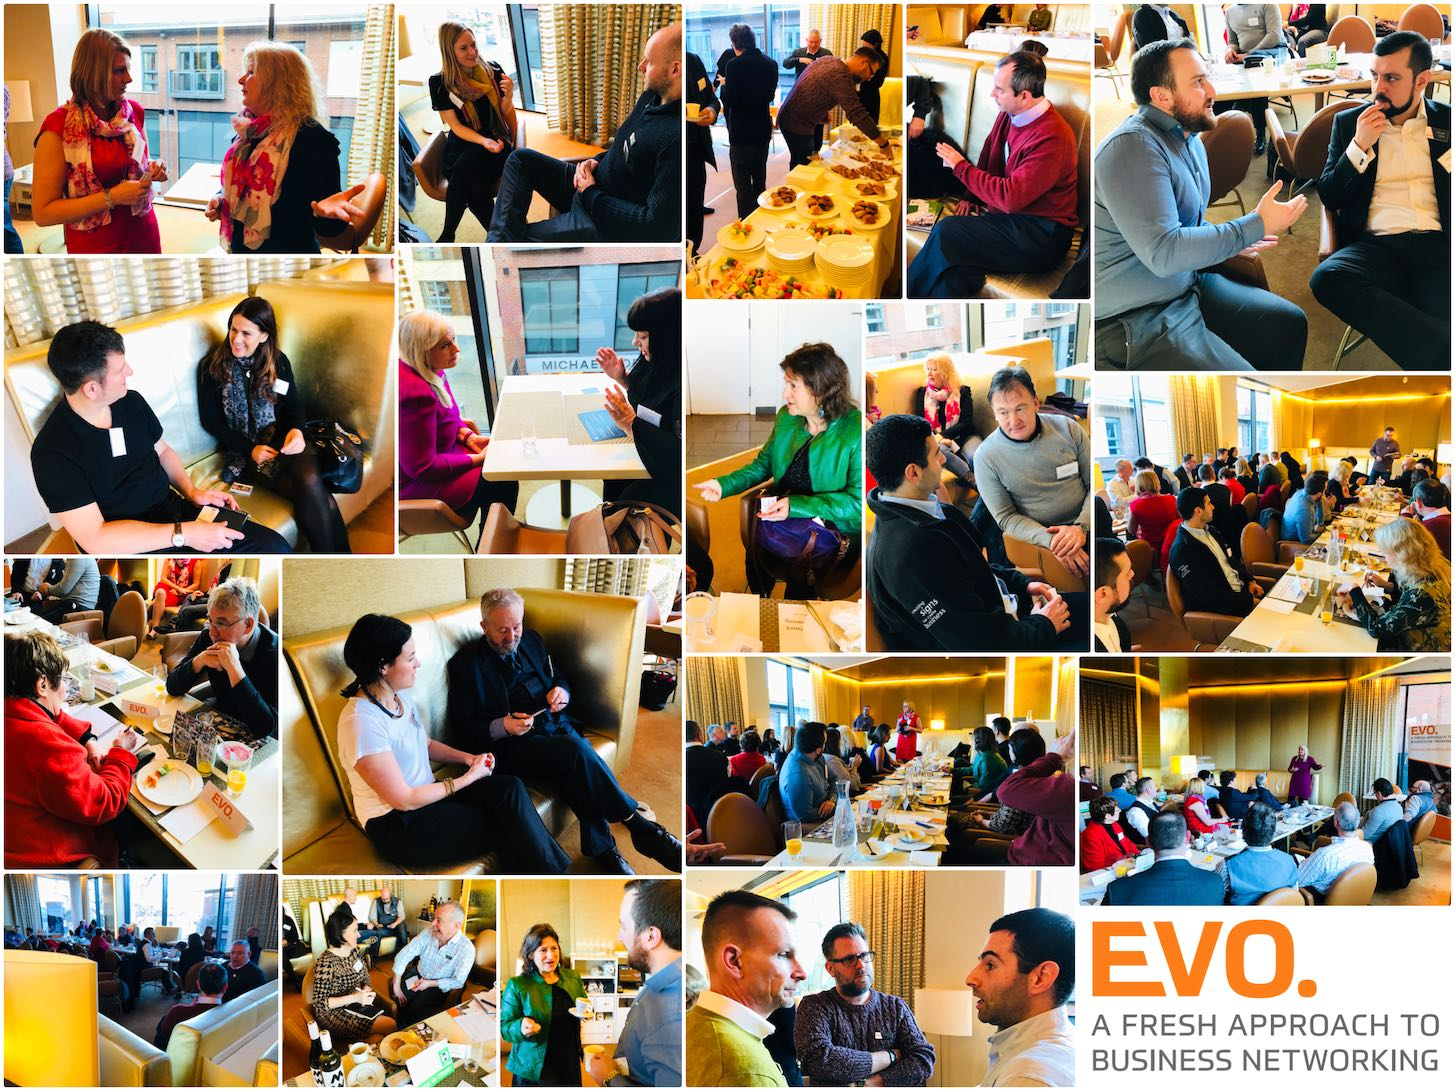 EVO Montage - 7th Feb 2018 LOWREZ.jpg